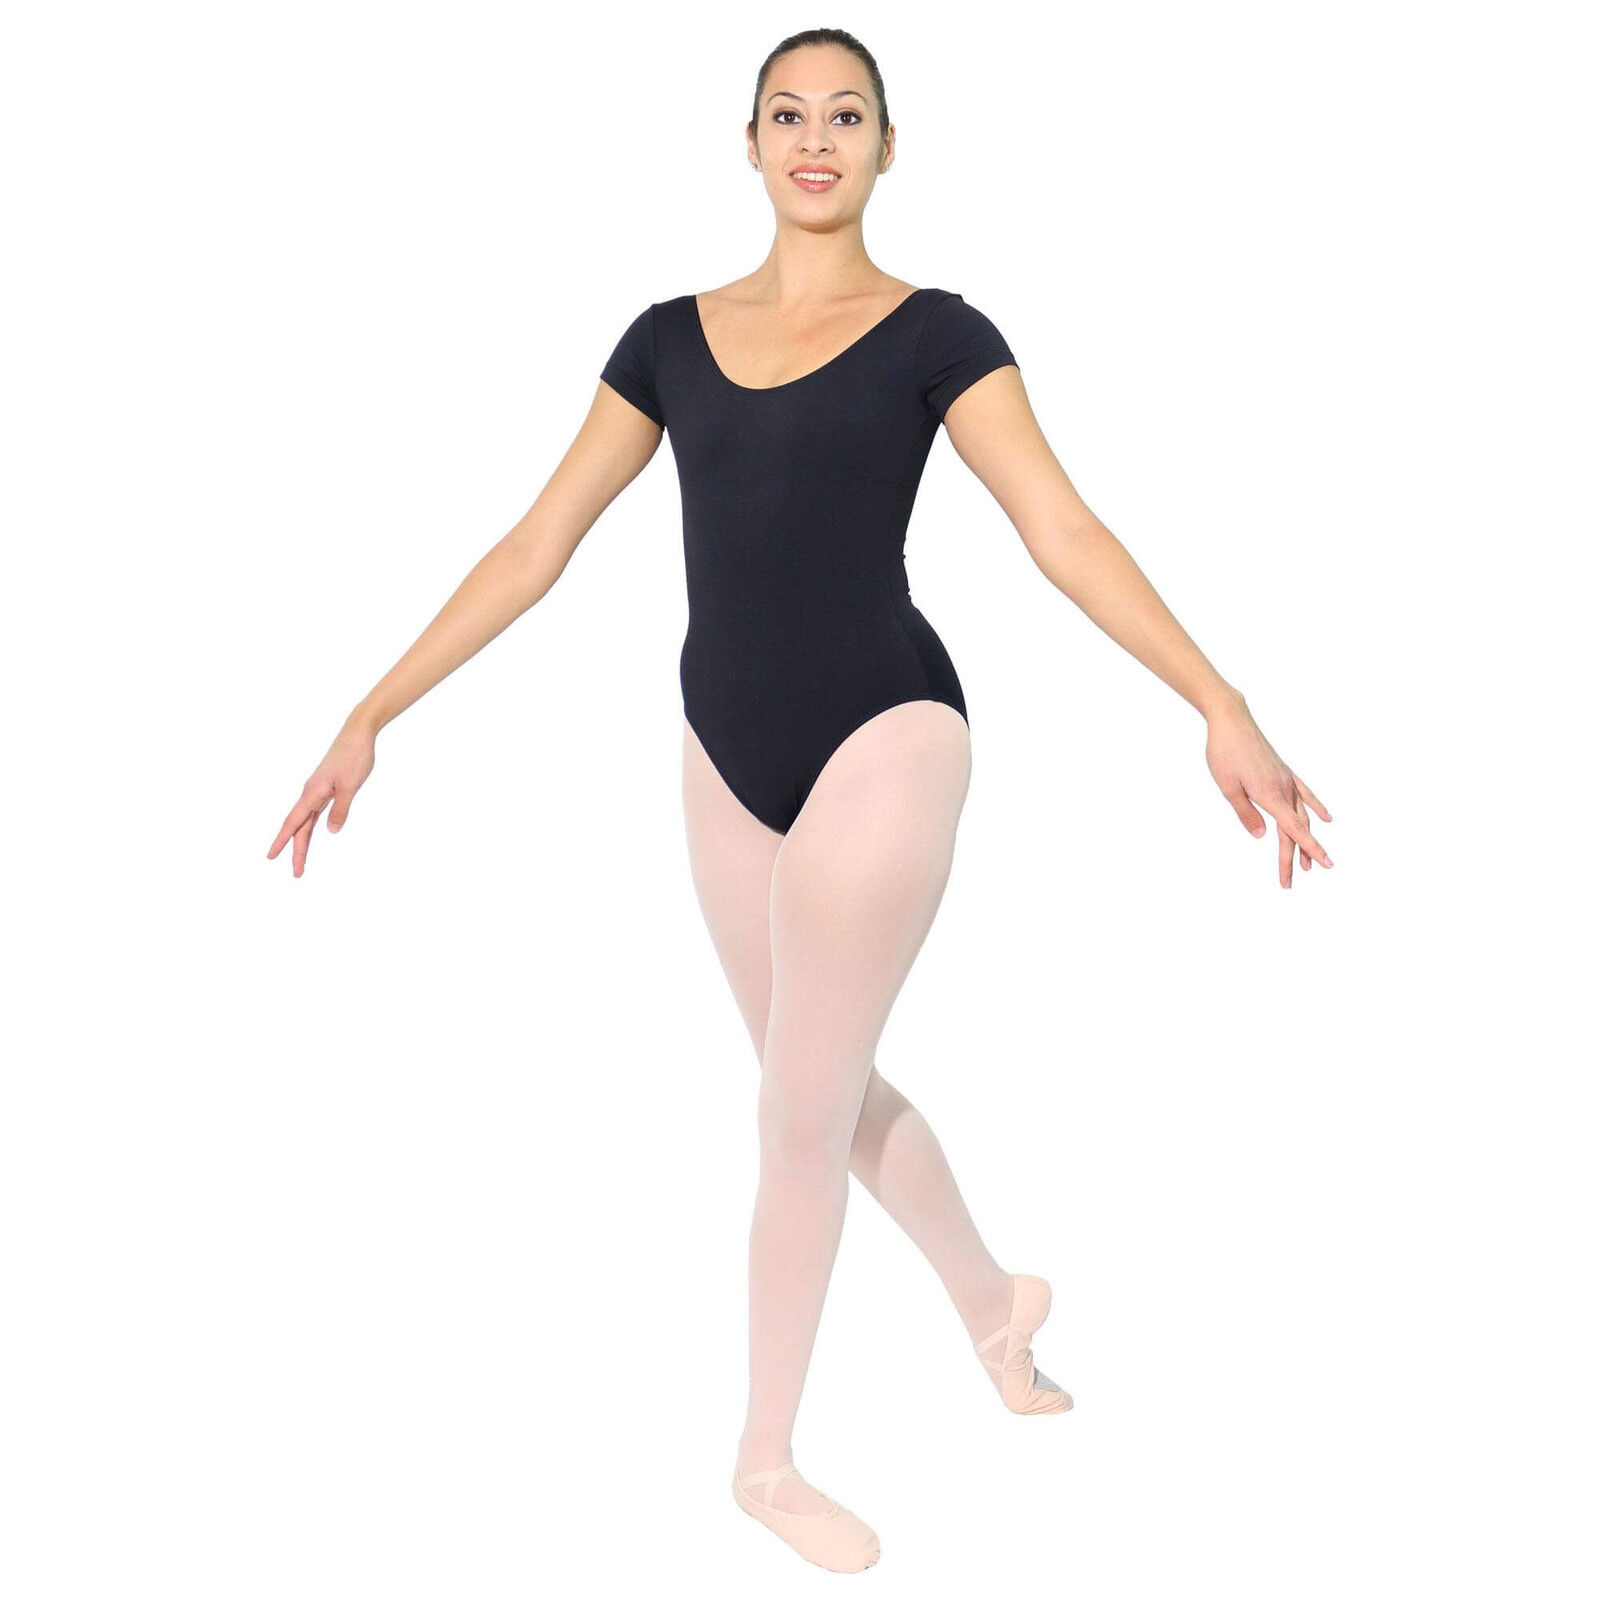 5c8c4f2ba8f Danzcue Adult Cotton Short Sleeve Ballet Cut Leotard Medium Black